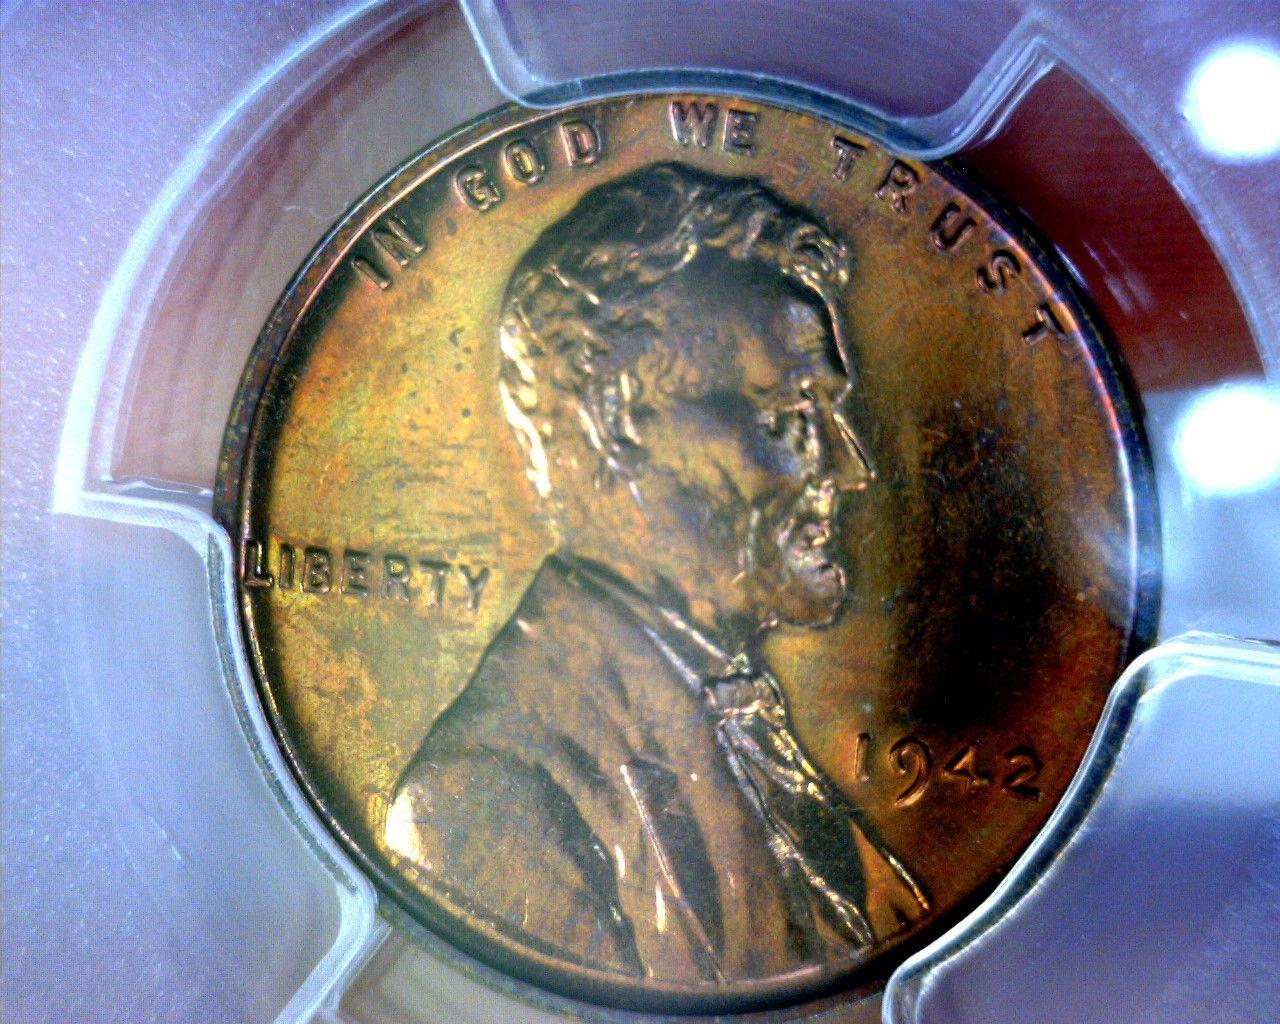 Beautiful pcgs 1942 pr64rb lincoln wheat penny pr 64 rb